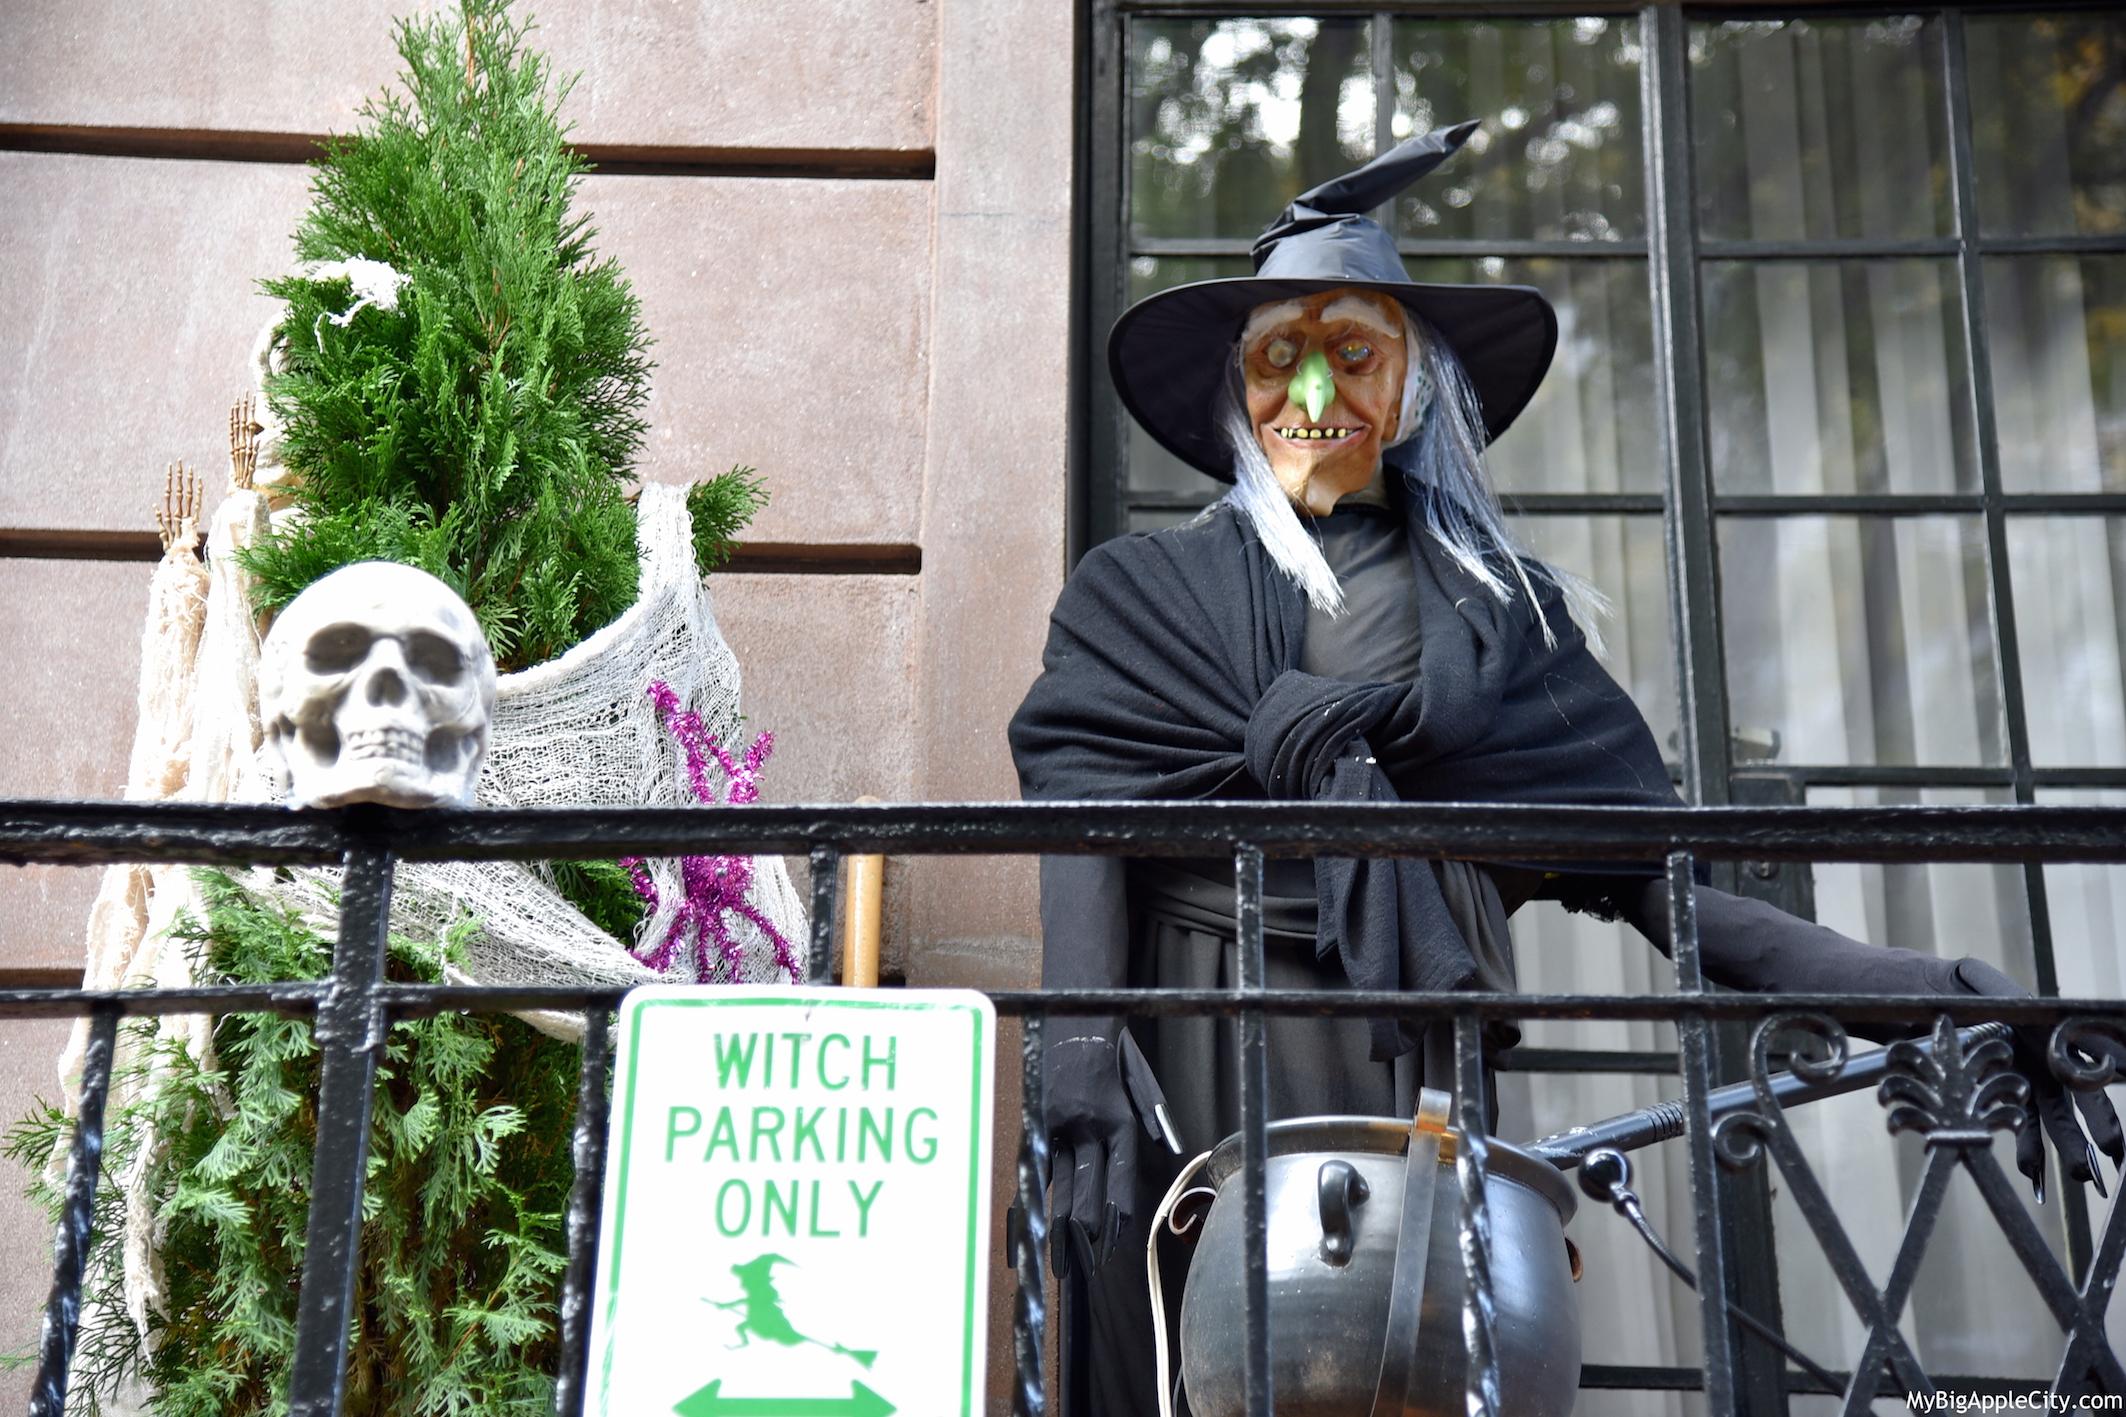 Witch-Halloween-NYC-2015-costume-best-travel-blog-mybigapplecity